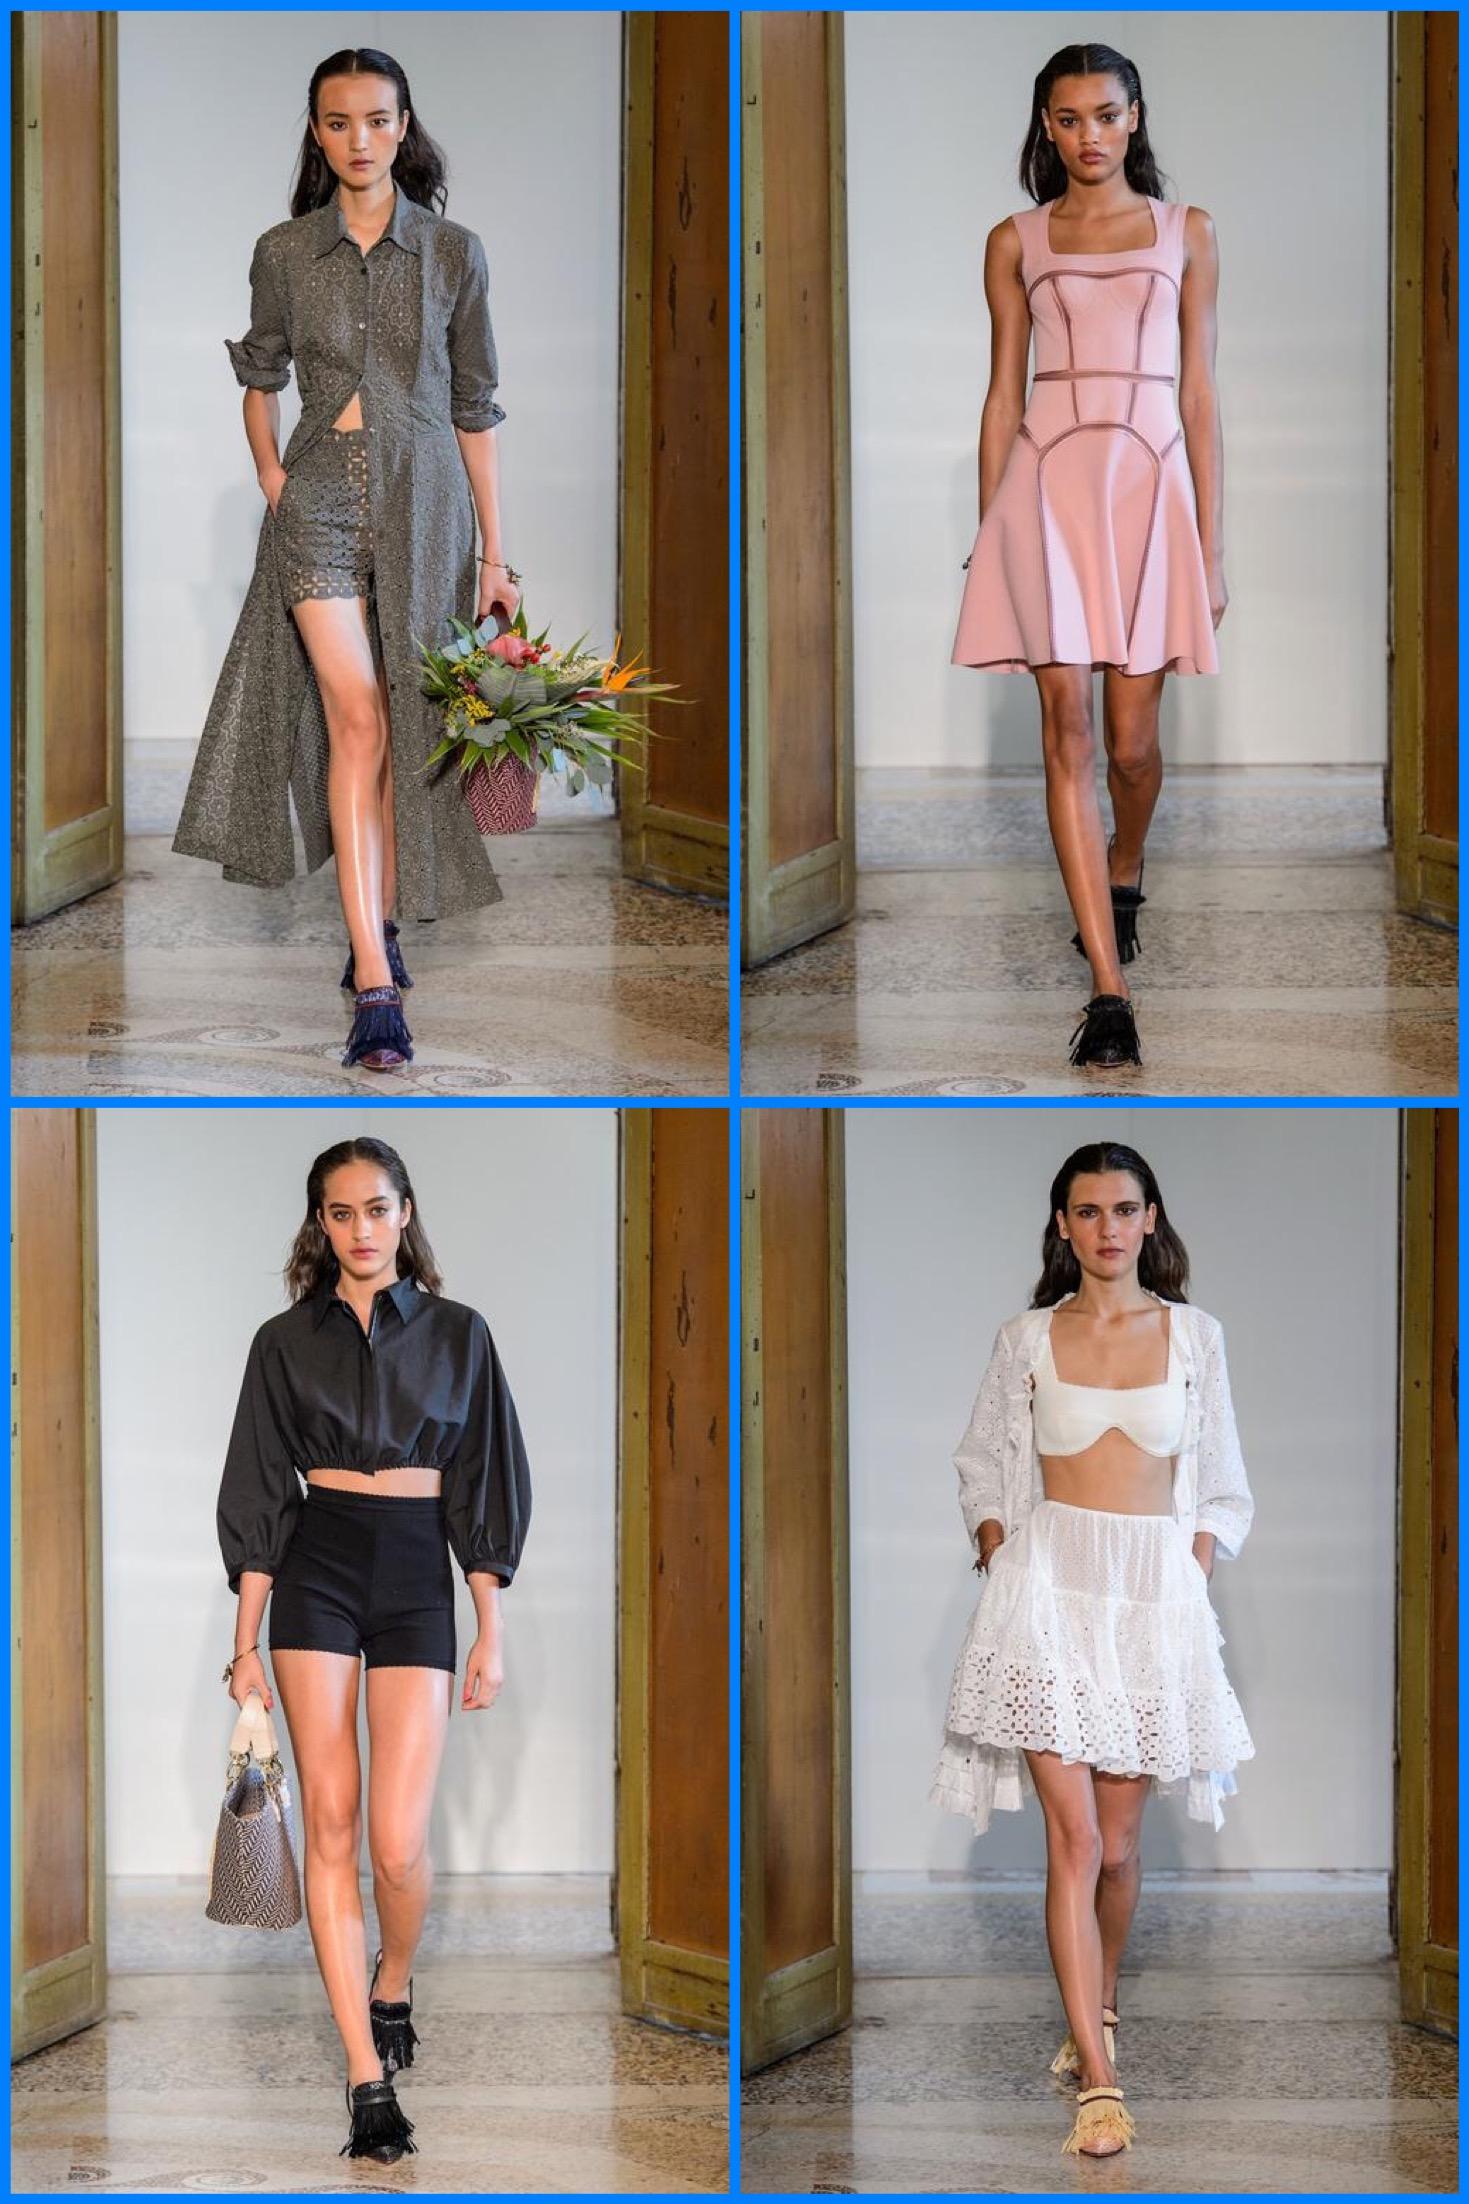 milano-fashion-week-pret-a-porter-spring-summer-2017-style-blumarine